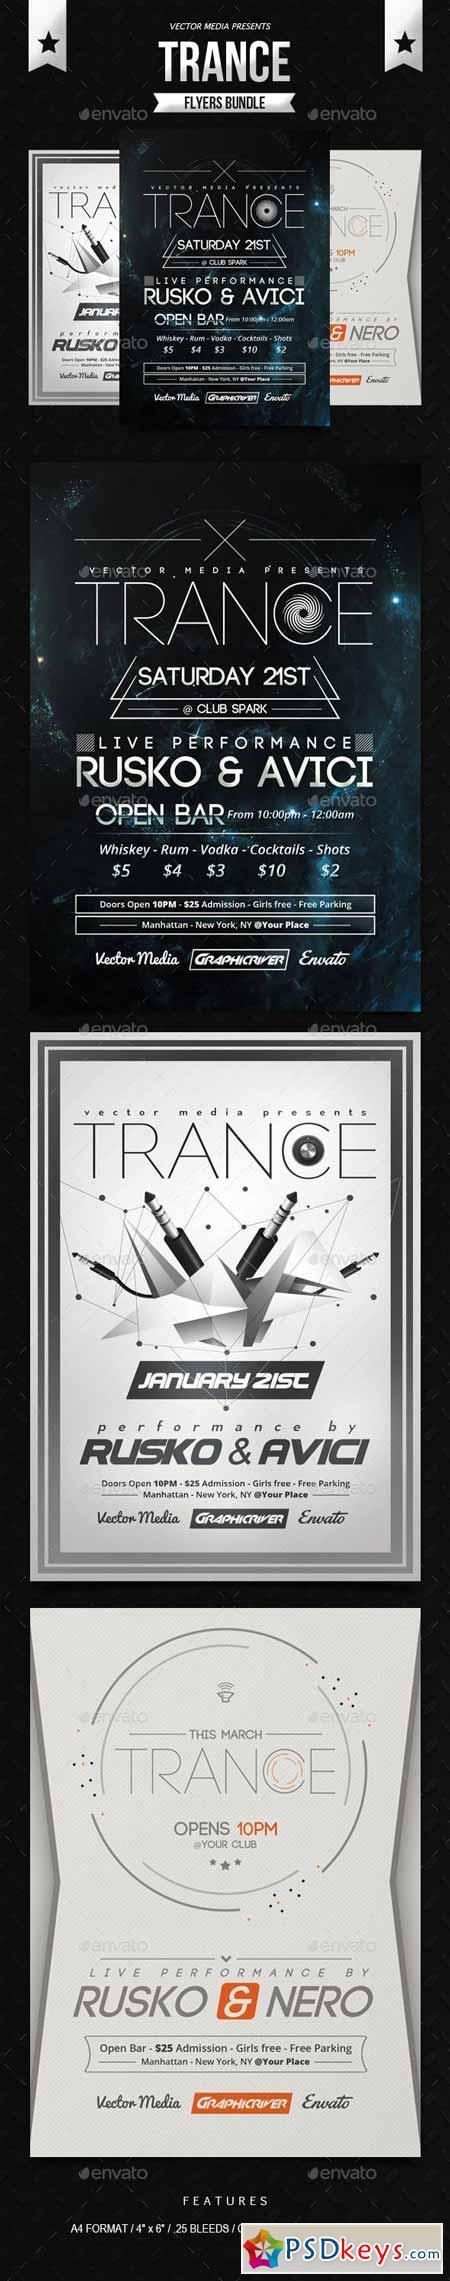 Trance - Flyers Bundle 10190823